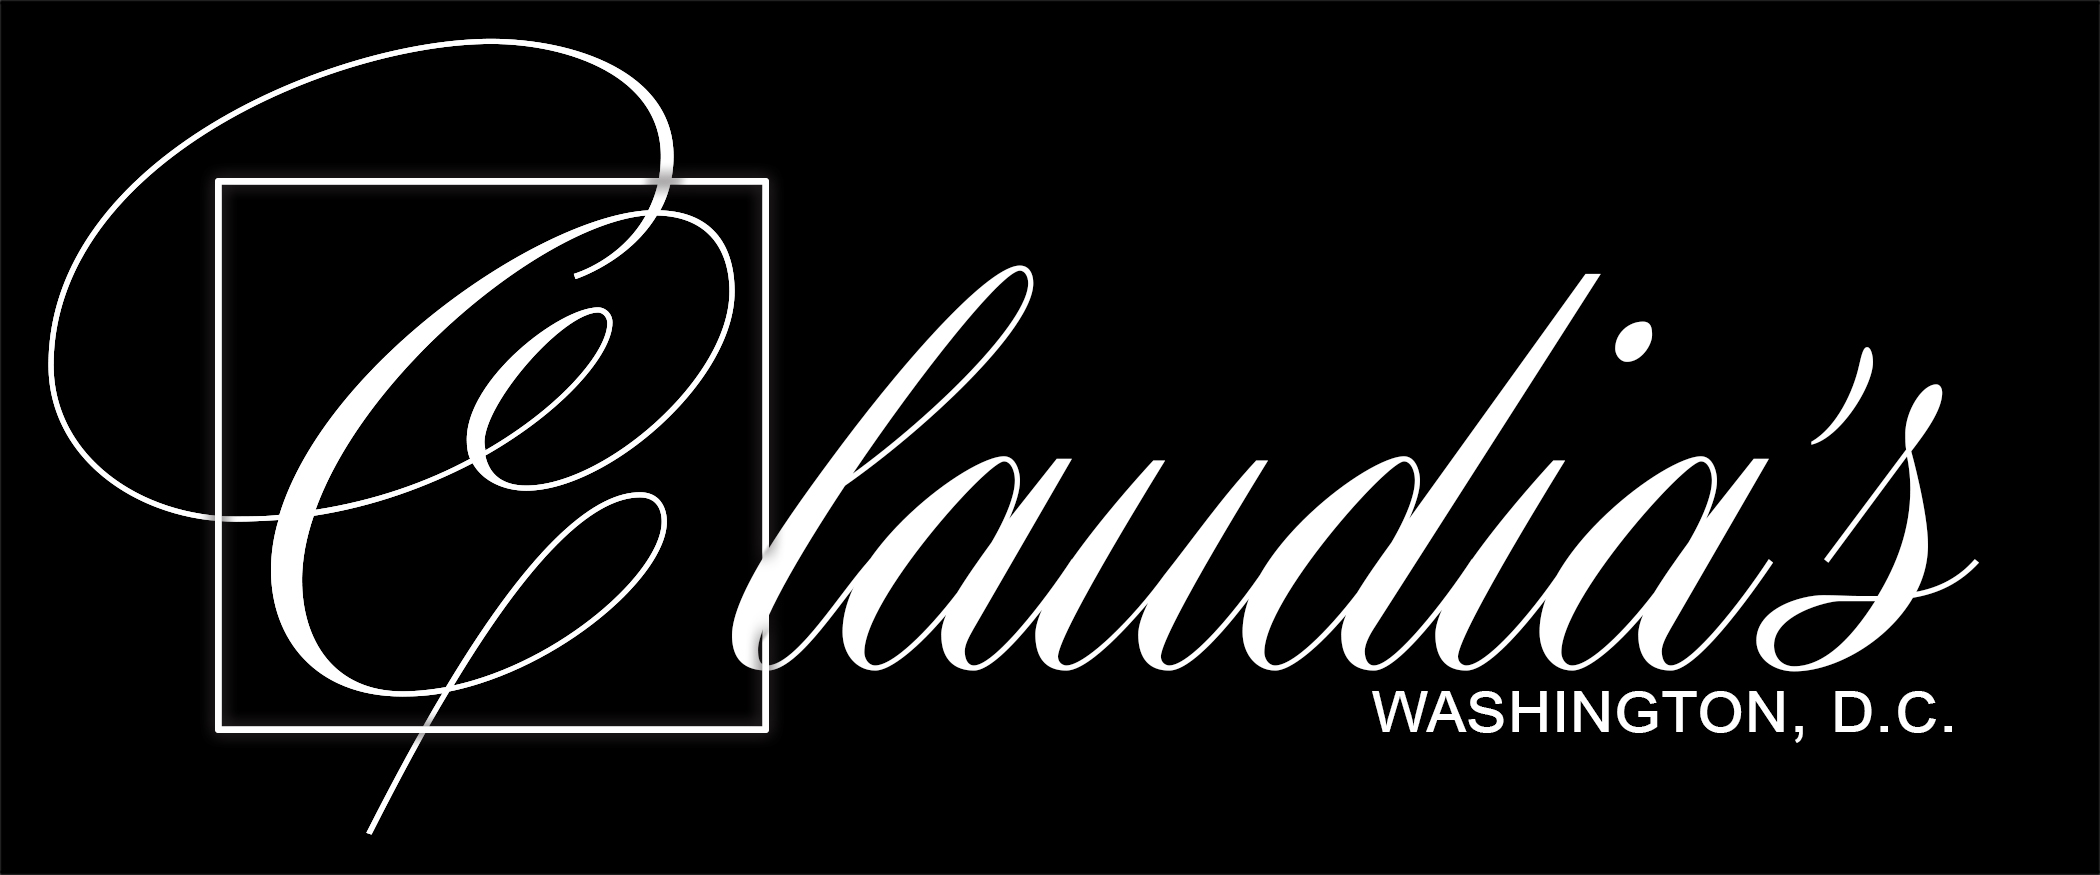 Claudia's Steakhouse Logo